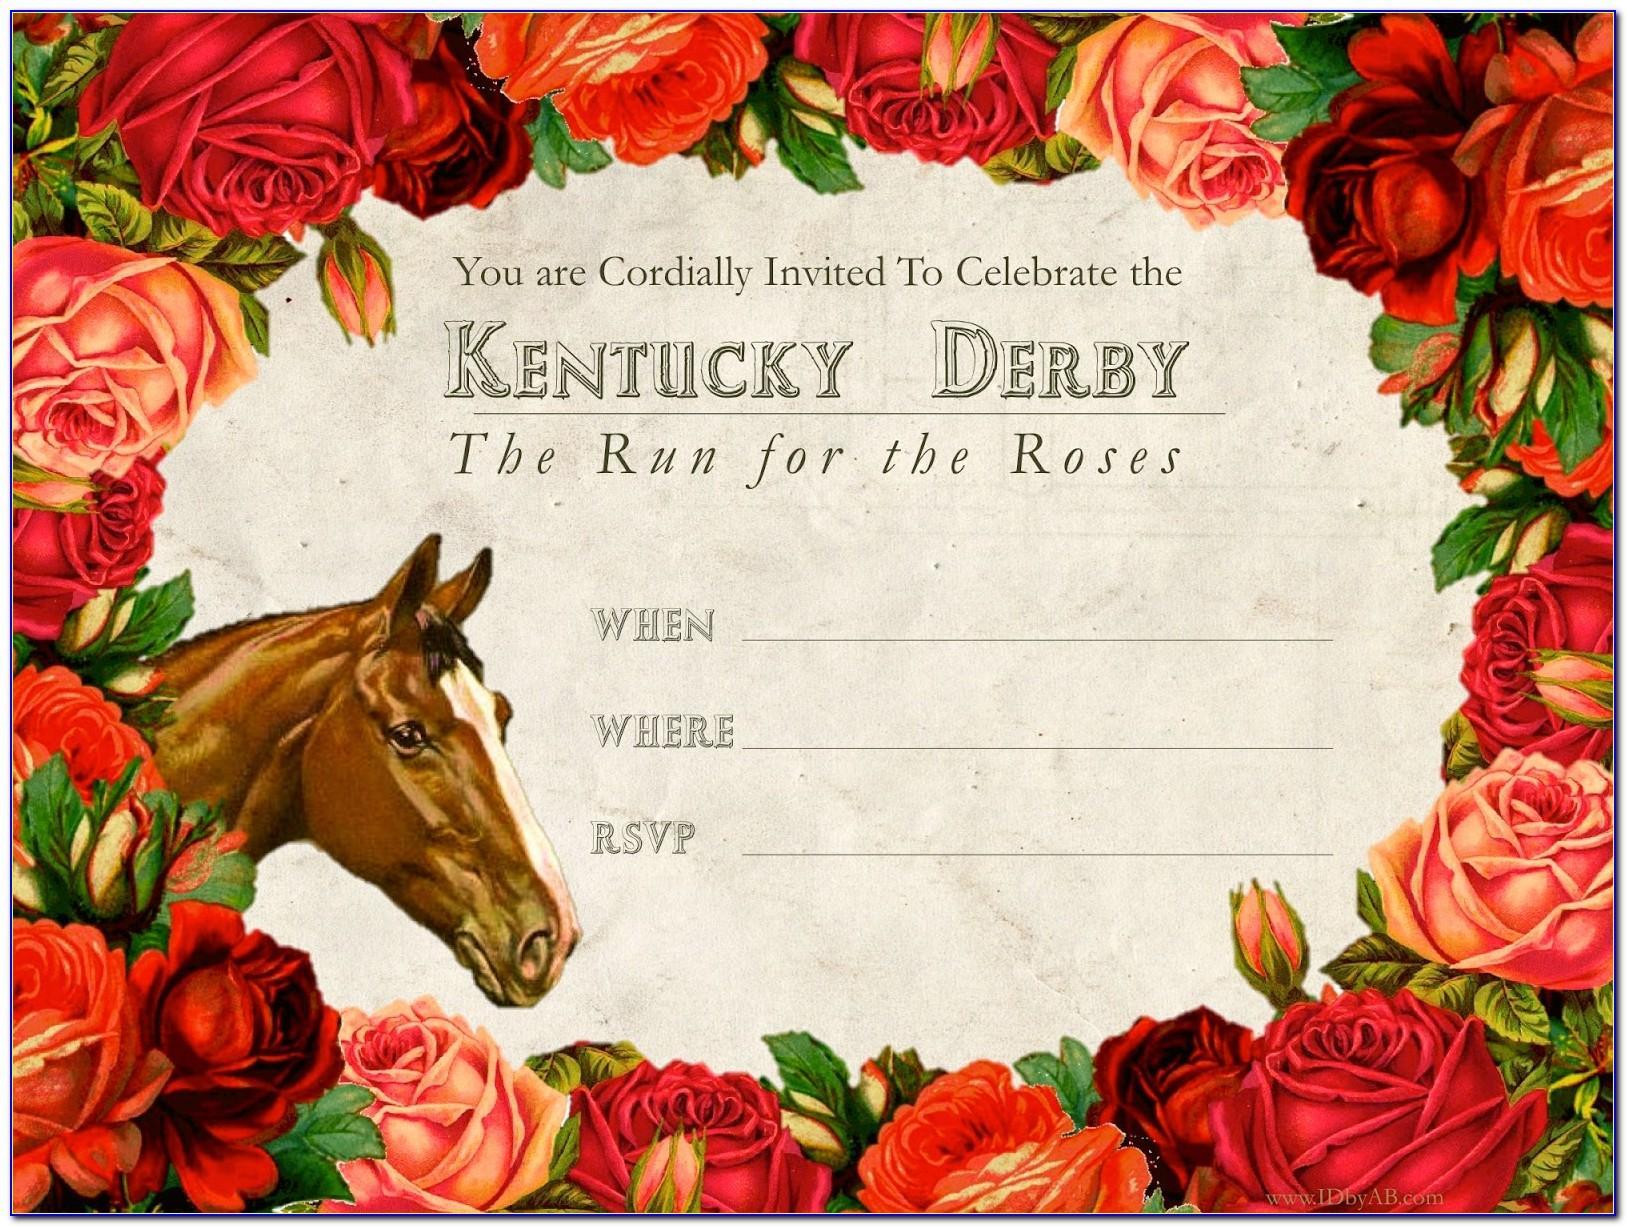 Kentucky Derby Invitation Templates Free